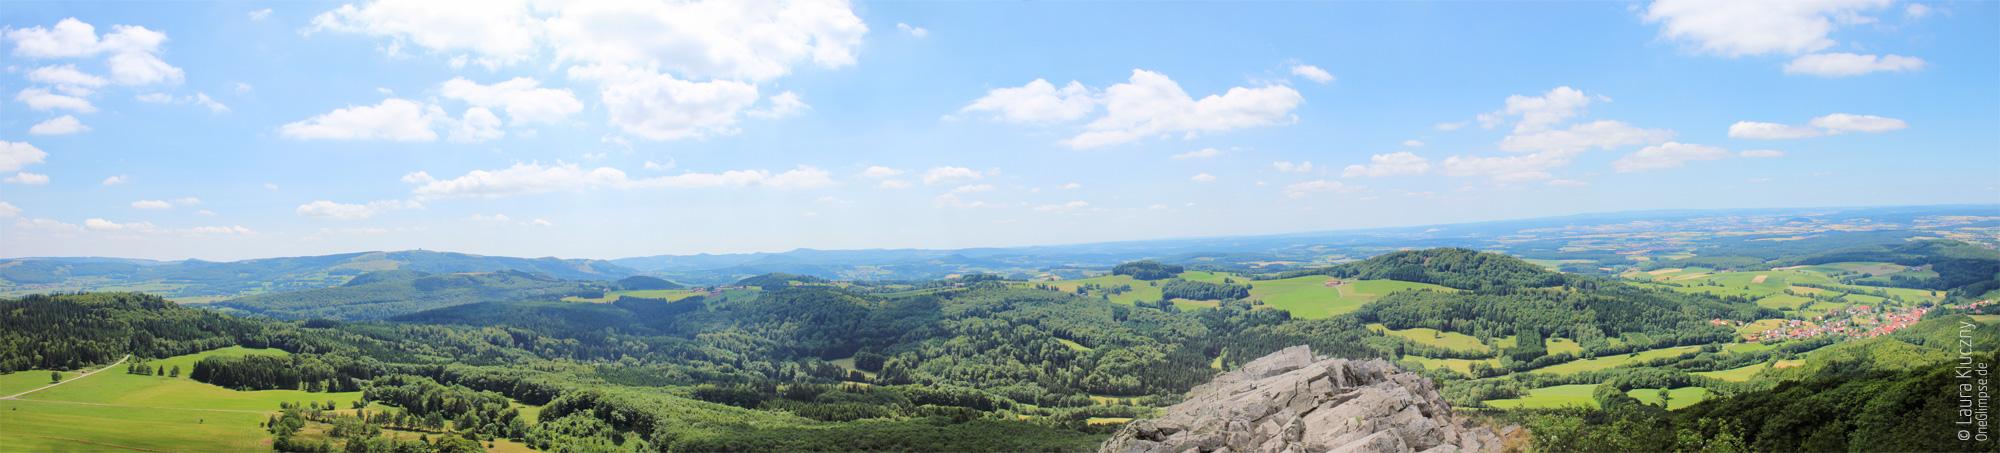 Rhön: Milseburg auf dem Gipfel, Panorama